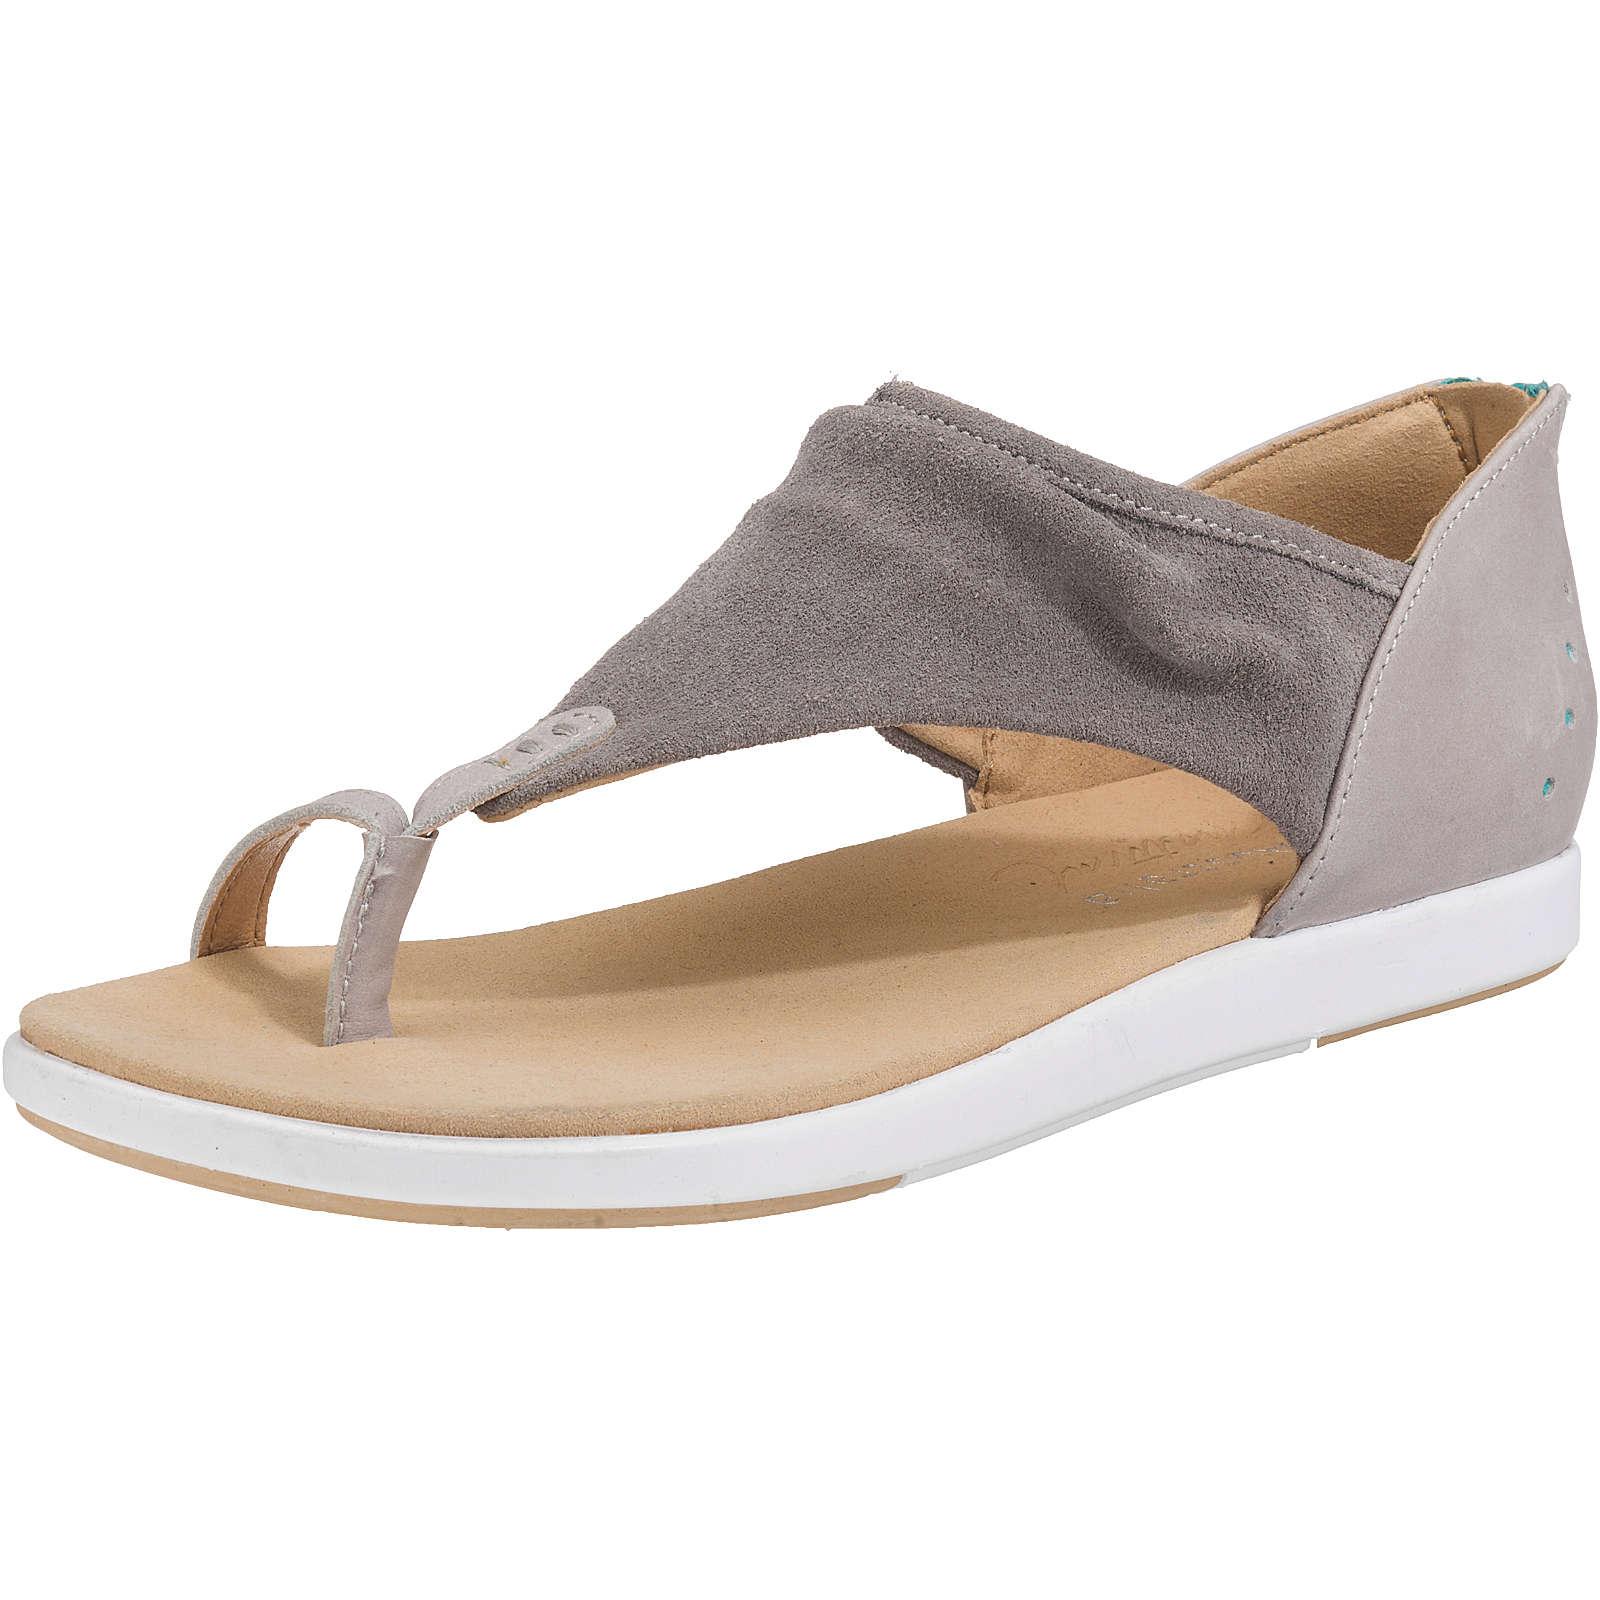 EMU Australia Yarra T-Steg-Sandalen hellgrau Damen Gr. 42 jetztbilligerkaufen